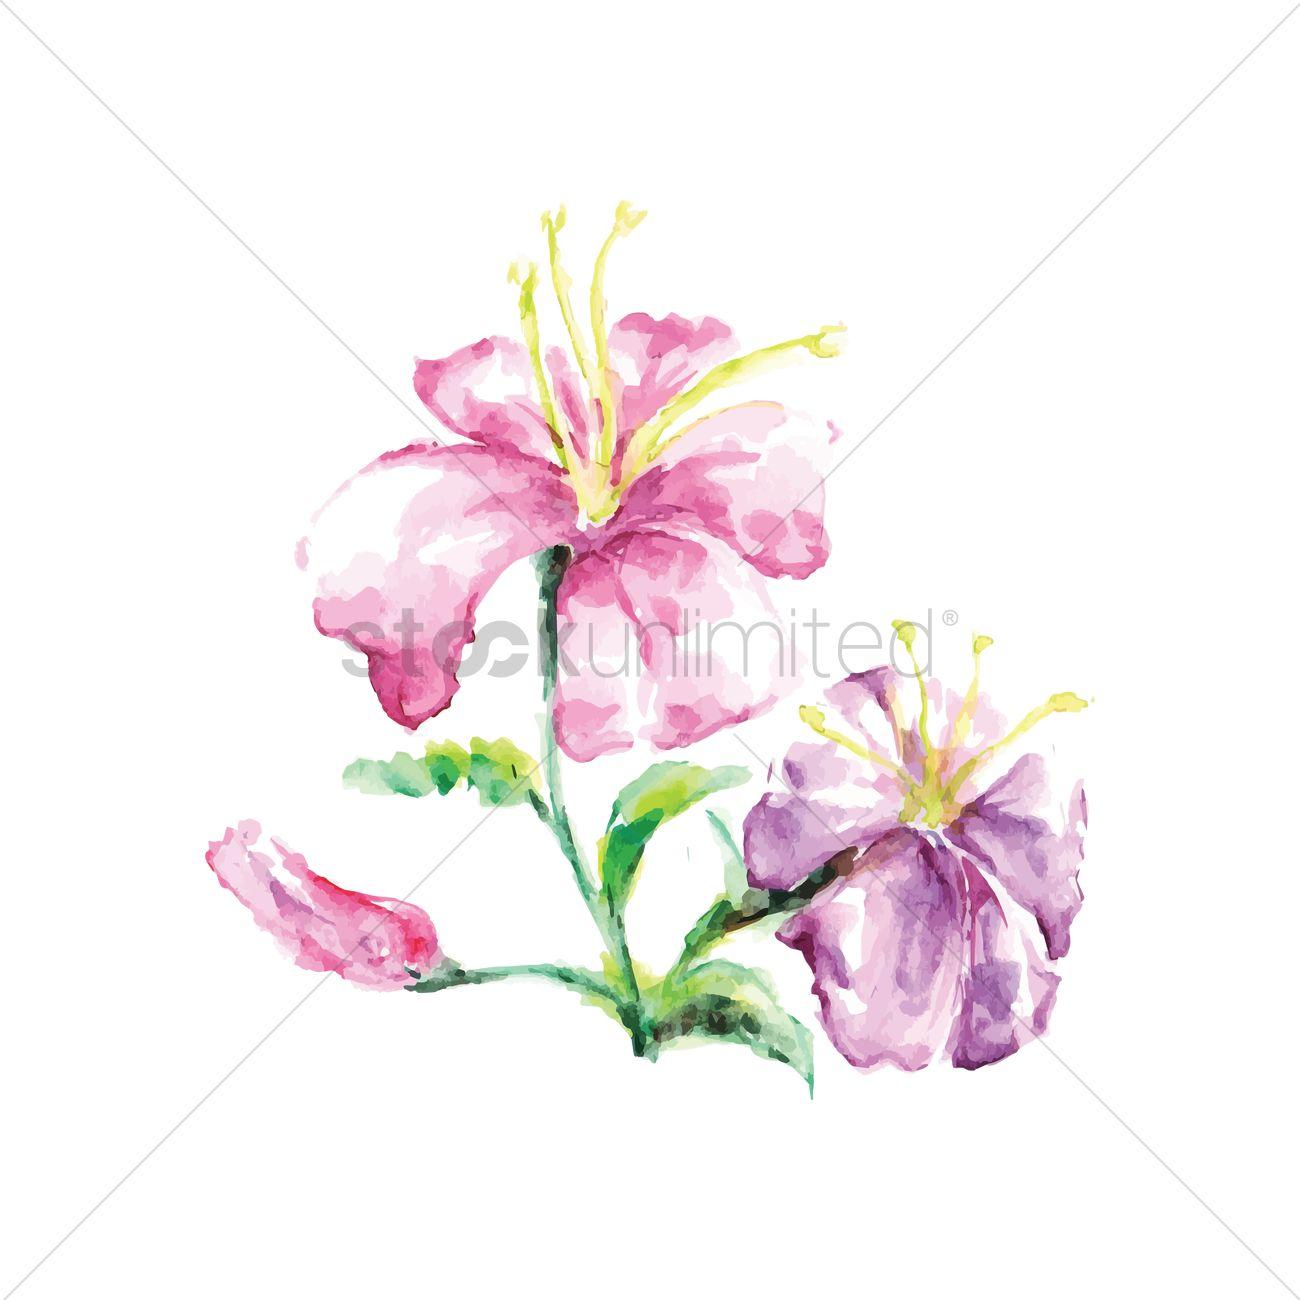 Hibiscus Flower Vector Image 1611146 Stockunlimited